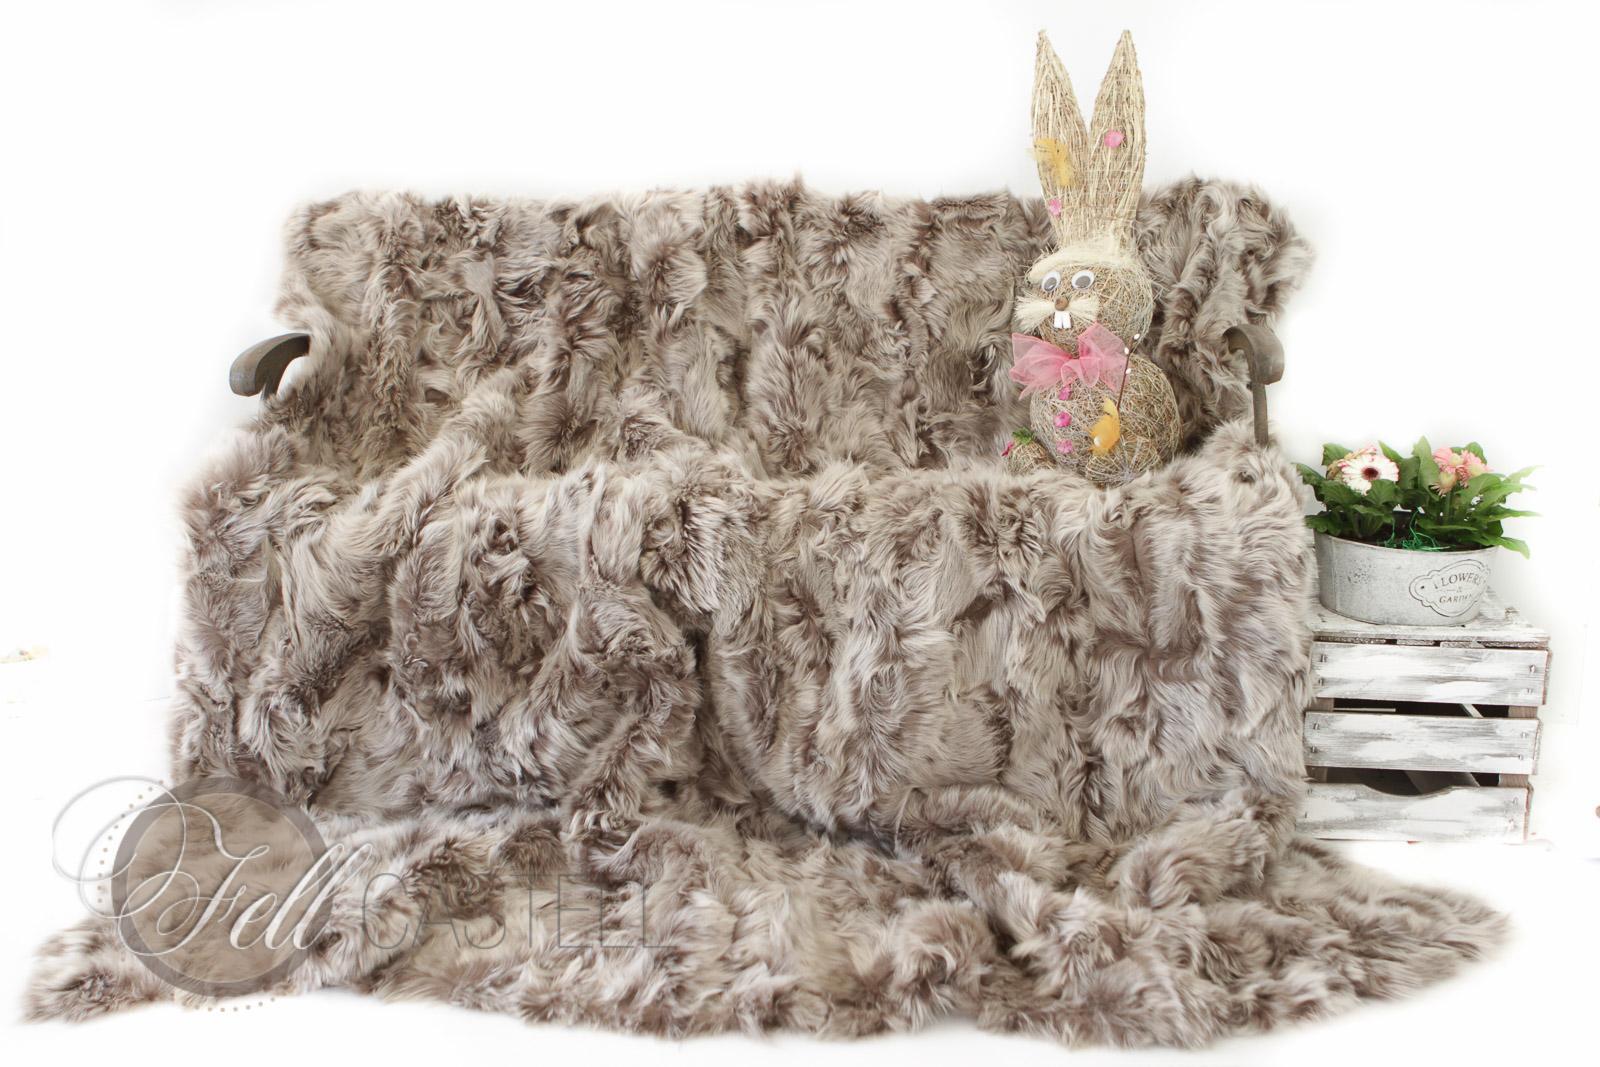 Lammfell Decke 225x210 cm Patchwork Taupe mit Snow Tops abgefüttert